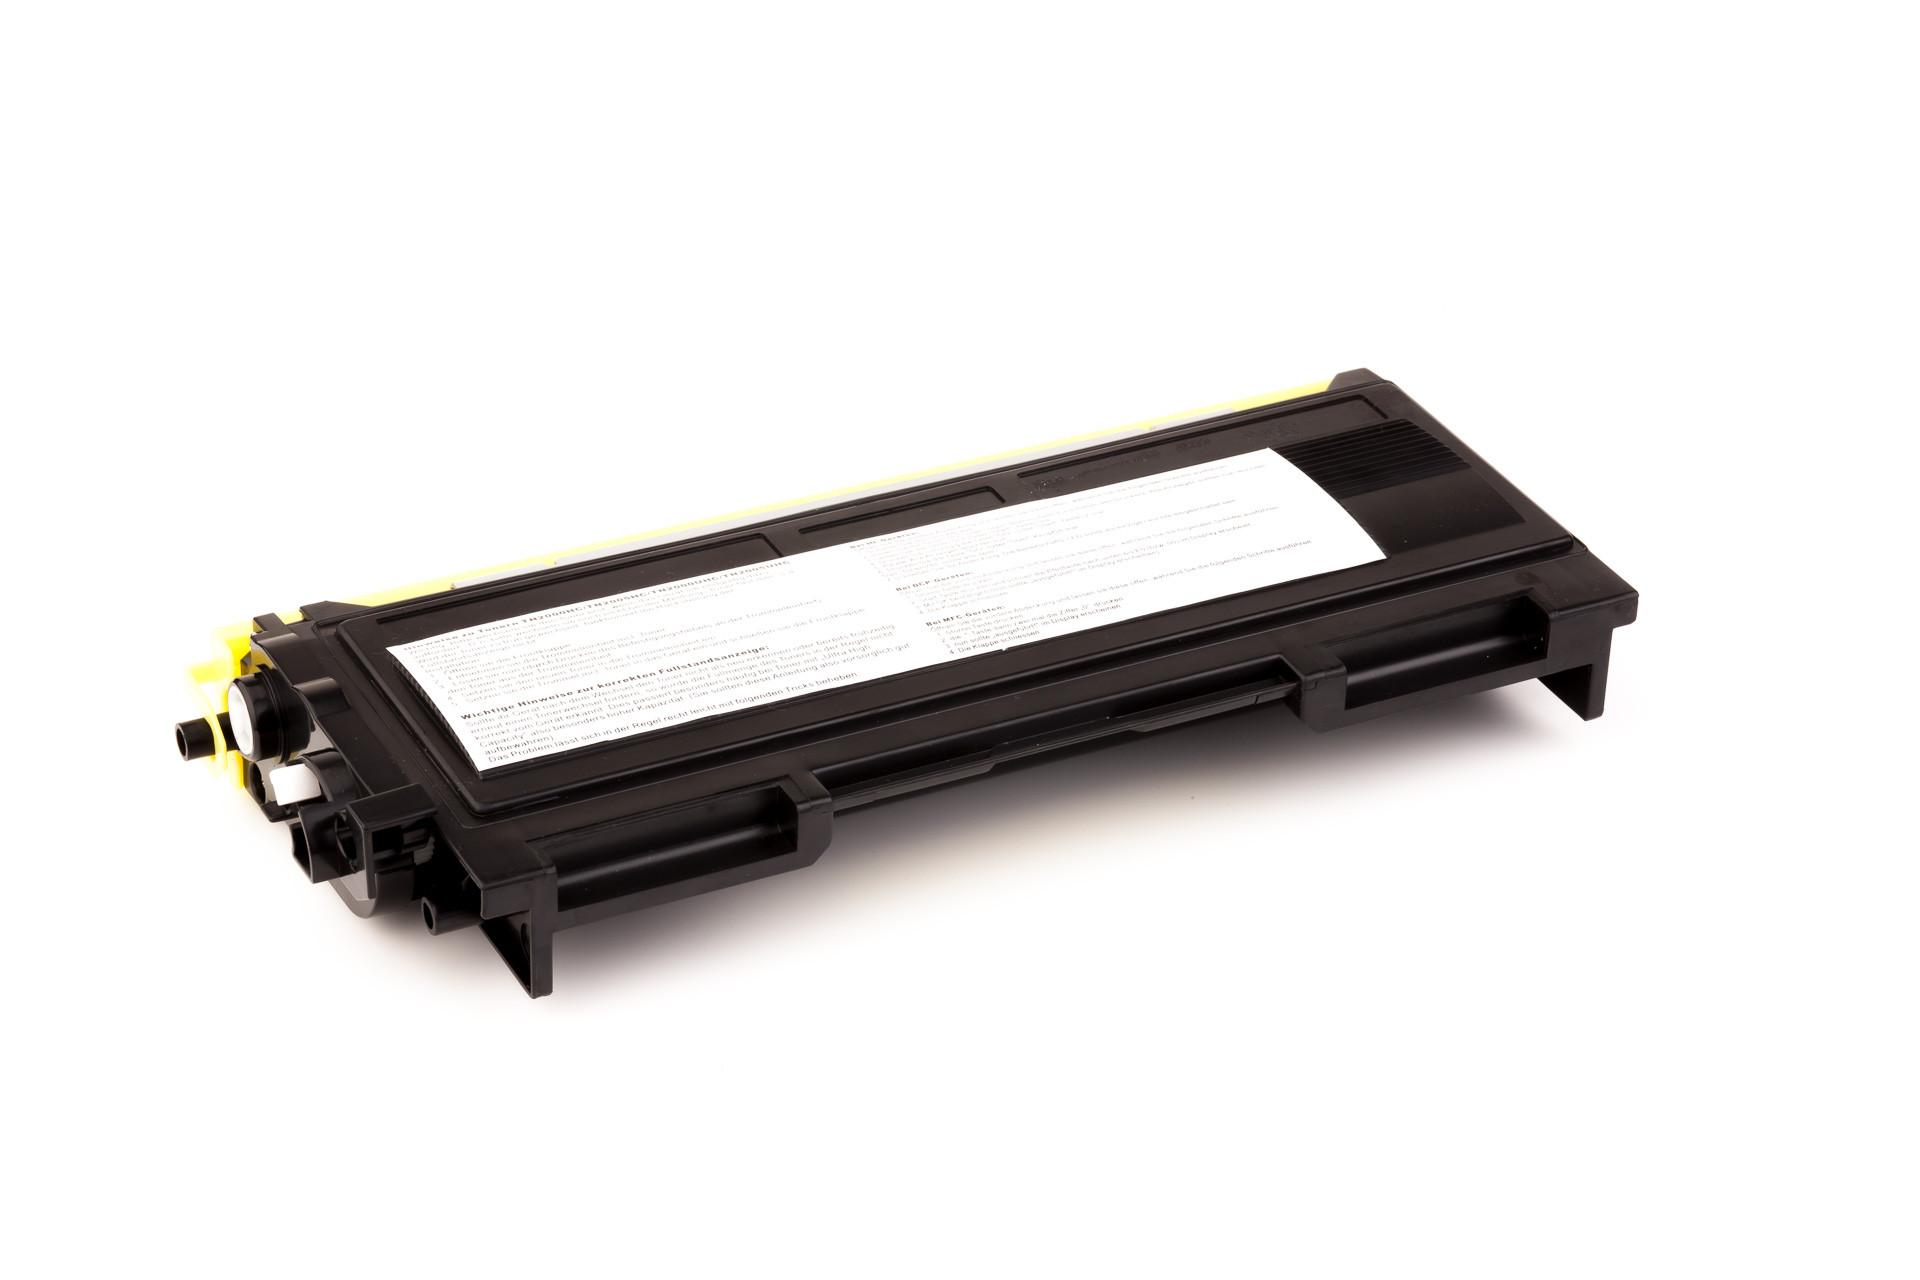 Cartouche de toner (alternatif) compatible à Brother - TN2000 / TN 2000 - HL 2030/2020/2040/2032/2050/2070 N/MFC 7220/7225 N/7420/7820